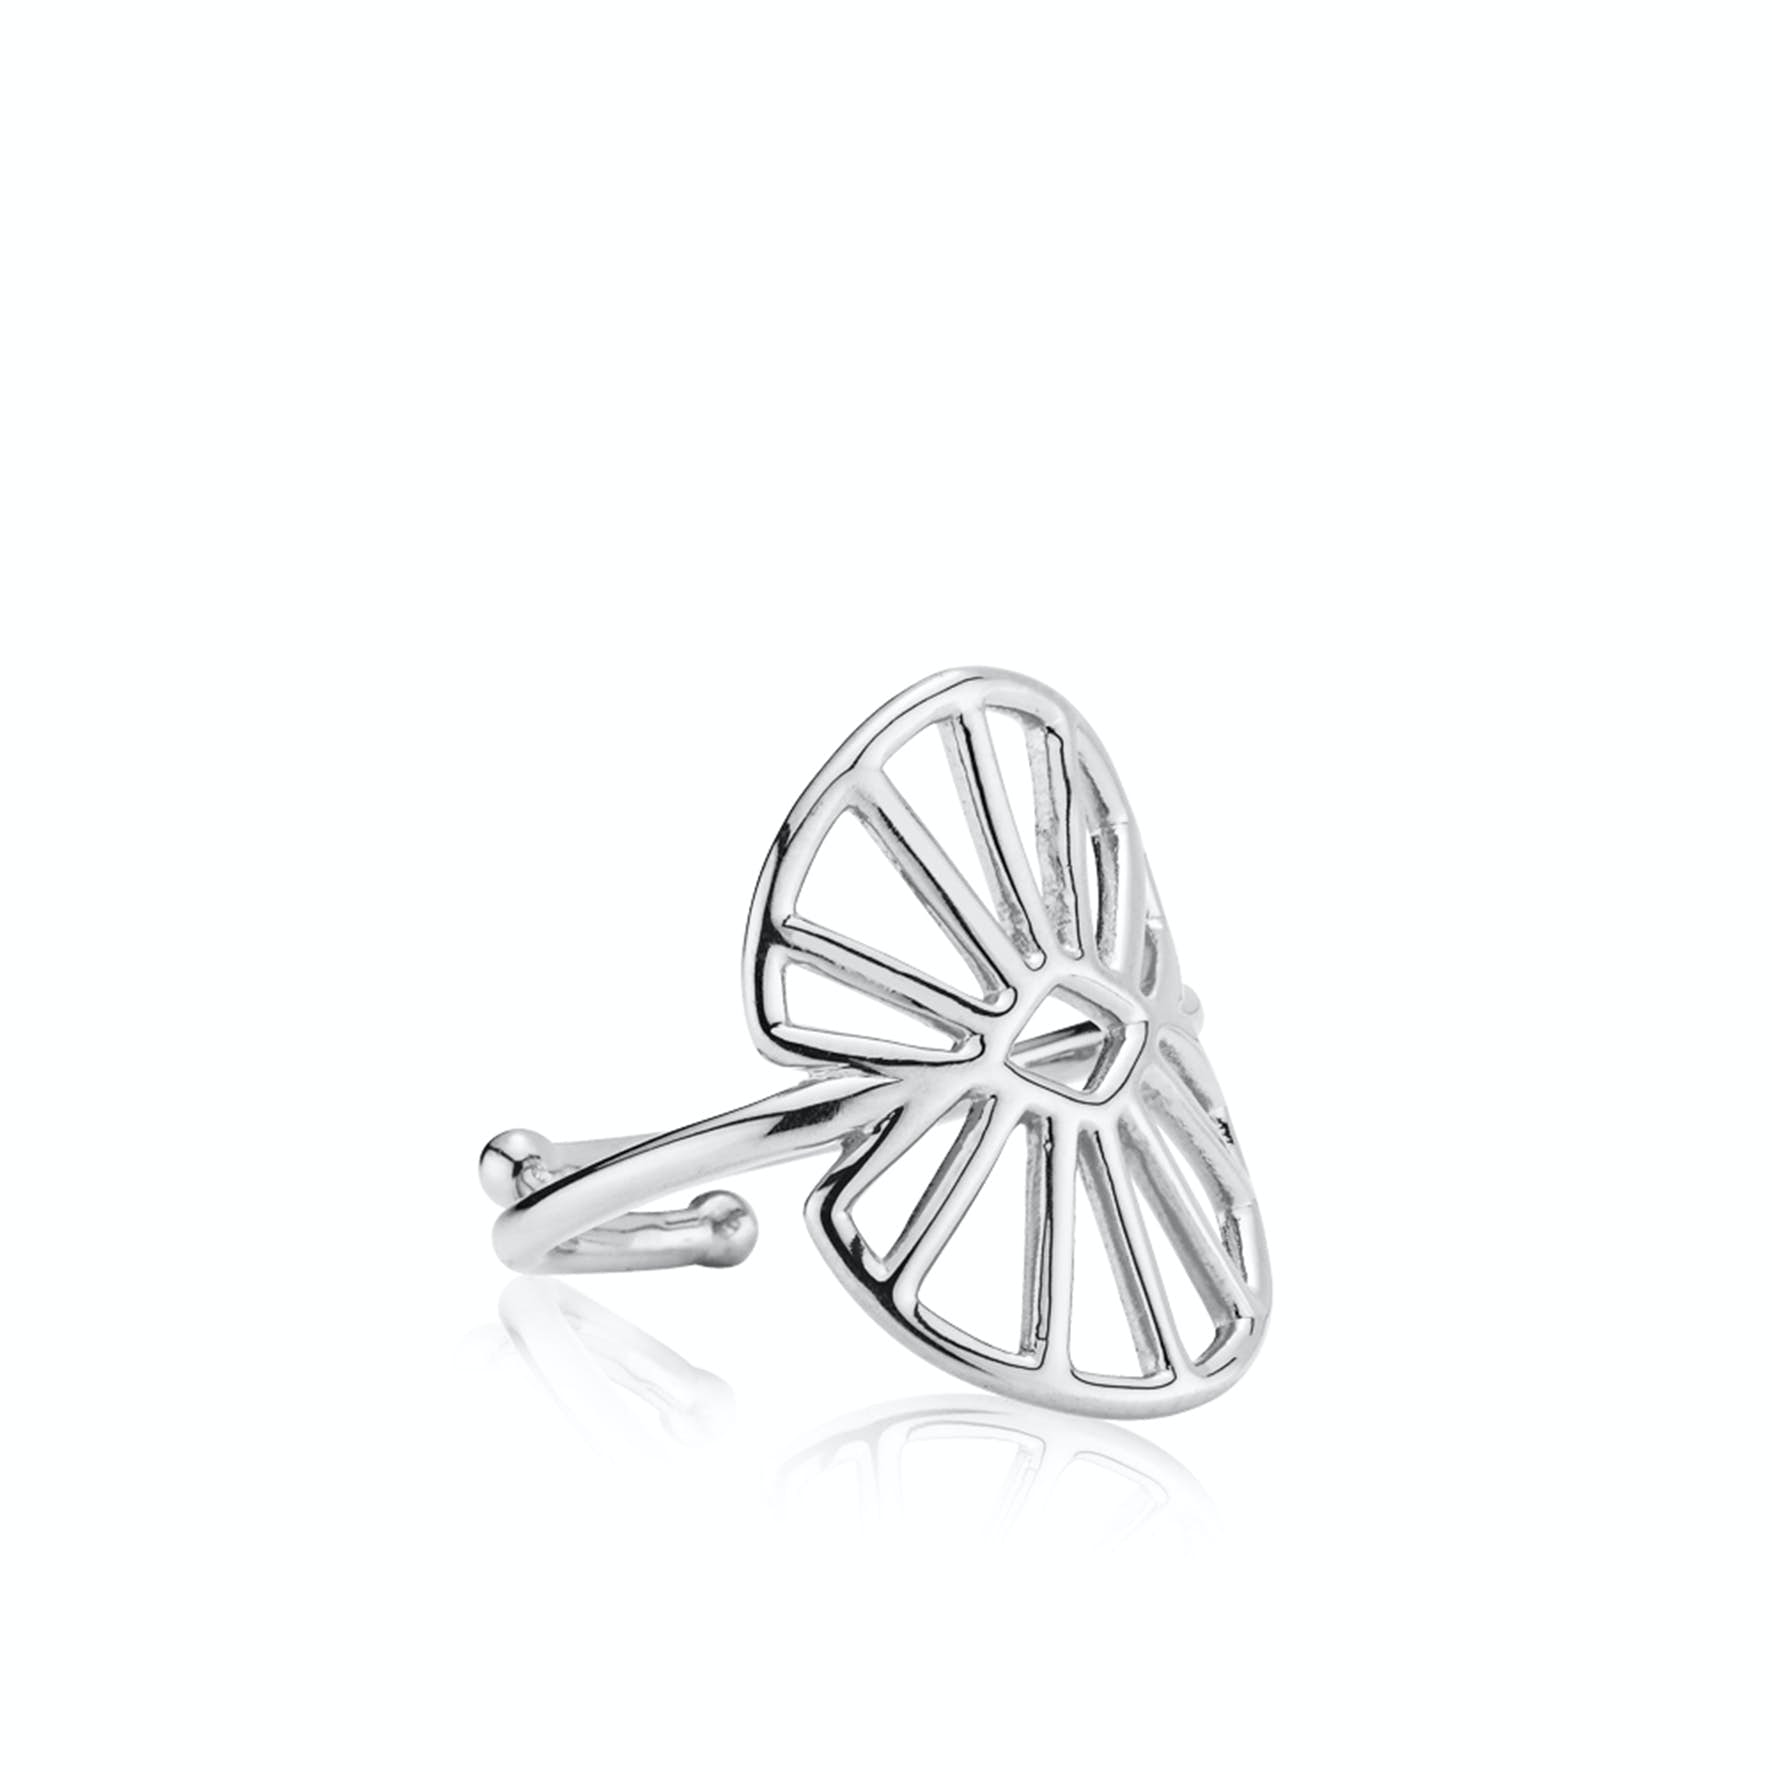 Sara by Sistie Medium Ring von Sistie in Silber Sterling 925